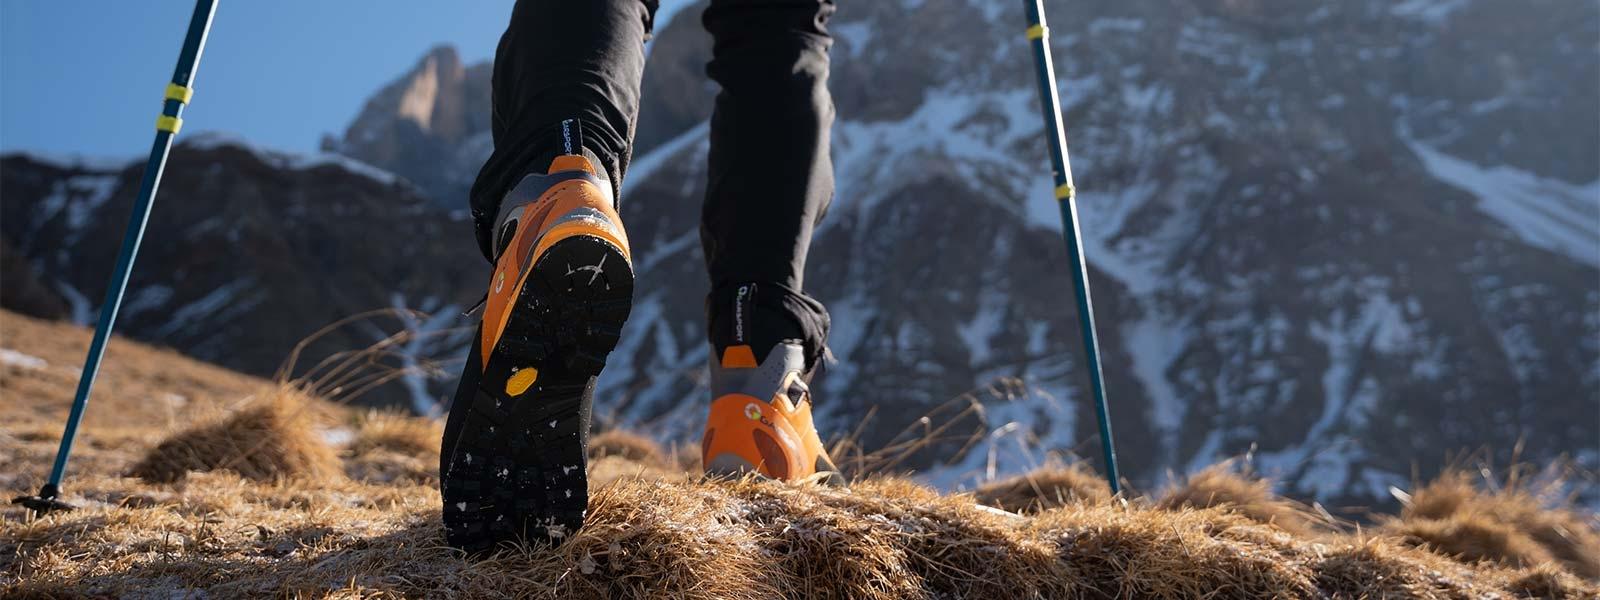 Alpine Garsport mountain boots for mountaineering and via ferrata